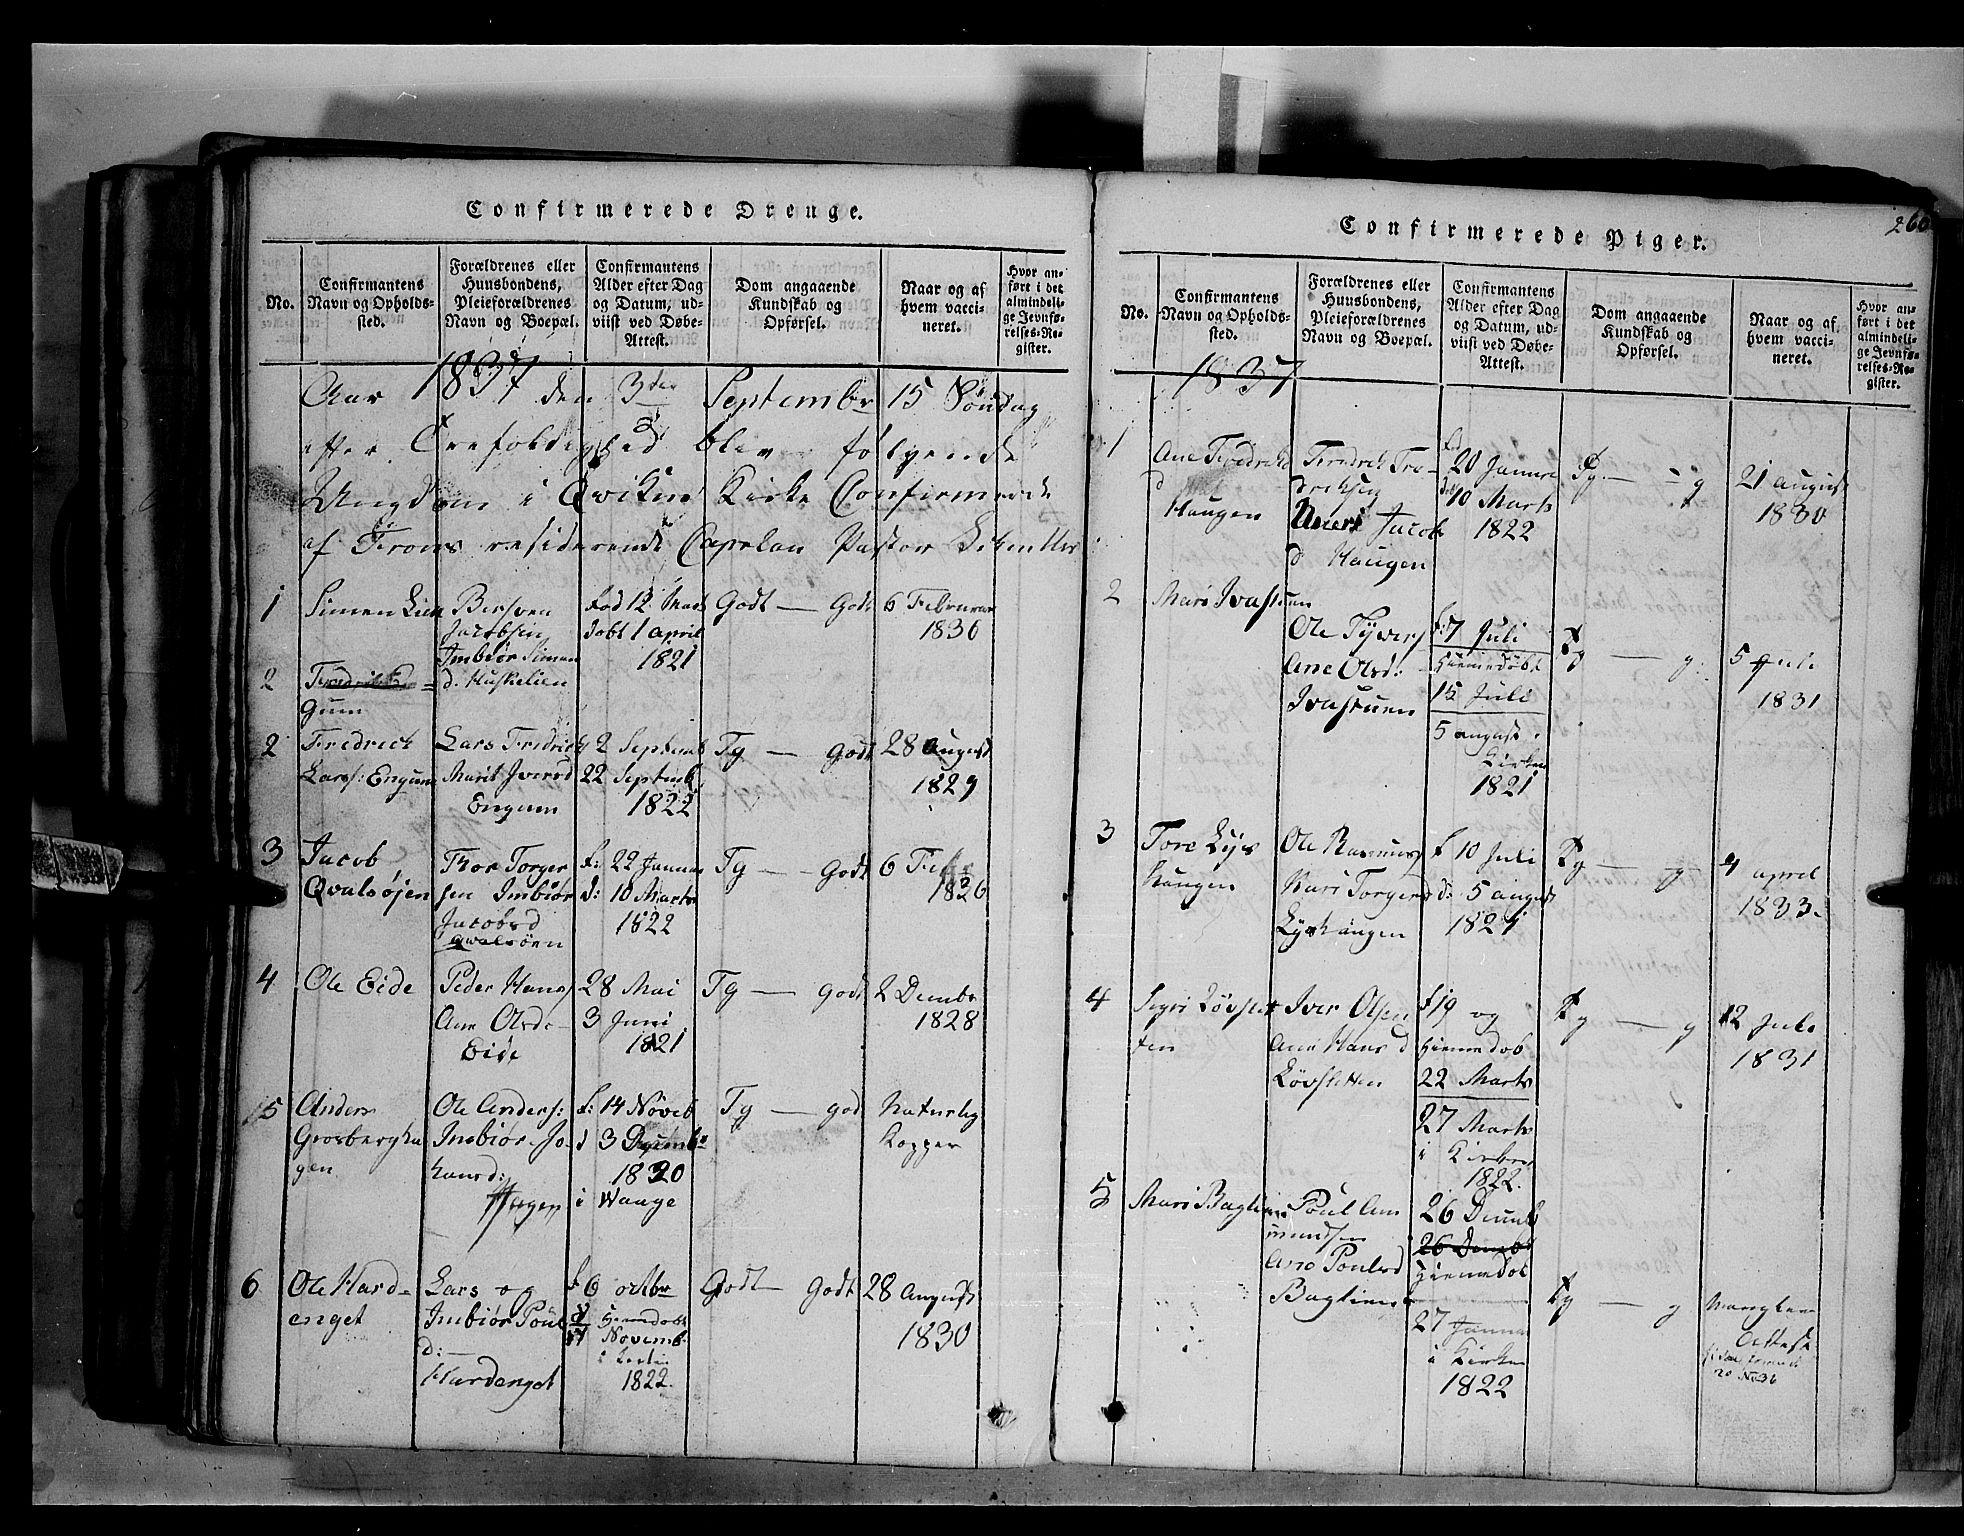 SAH, Fron prestekontor, H/Ha/Hab/L0003: Klokkerbok nr. 3, 1816-1850, s. 260